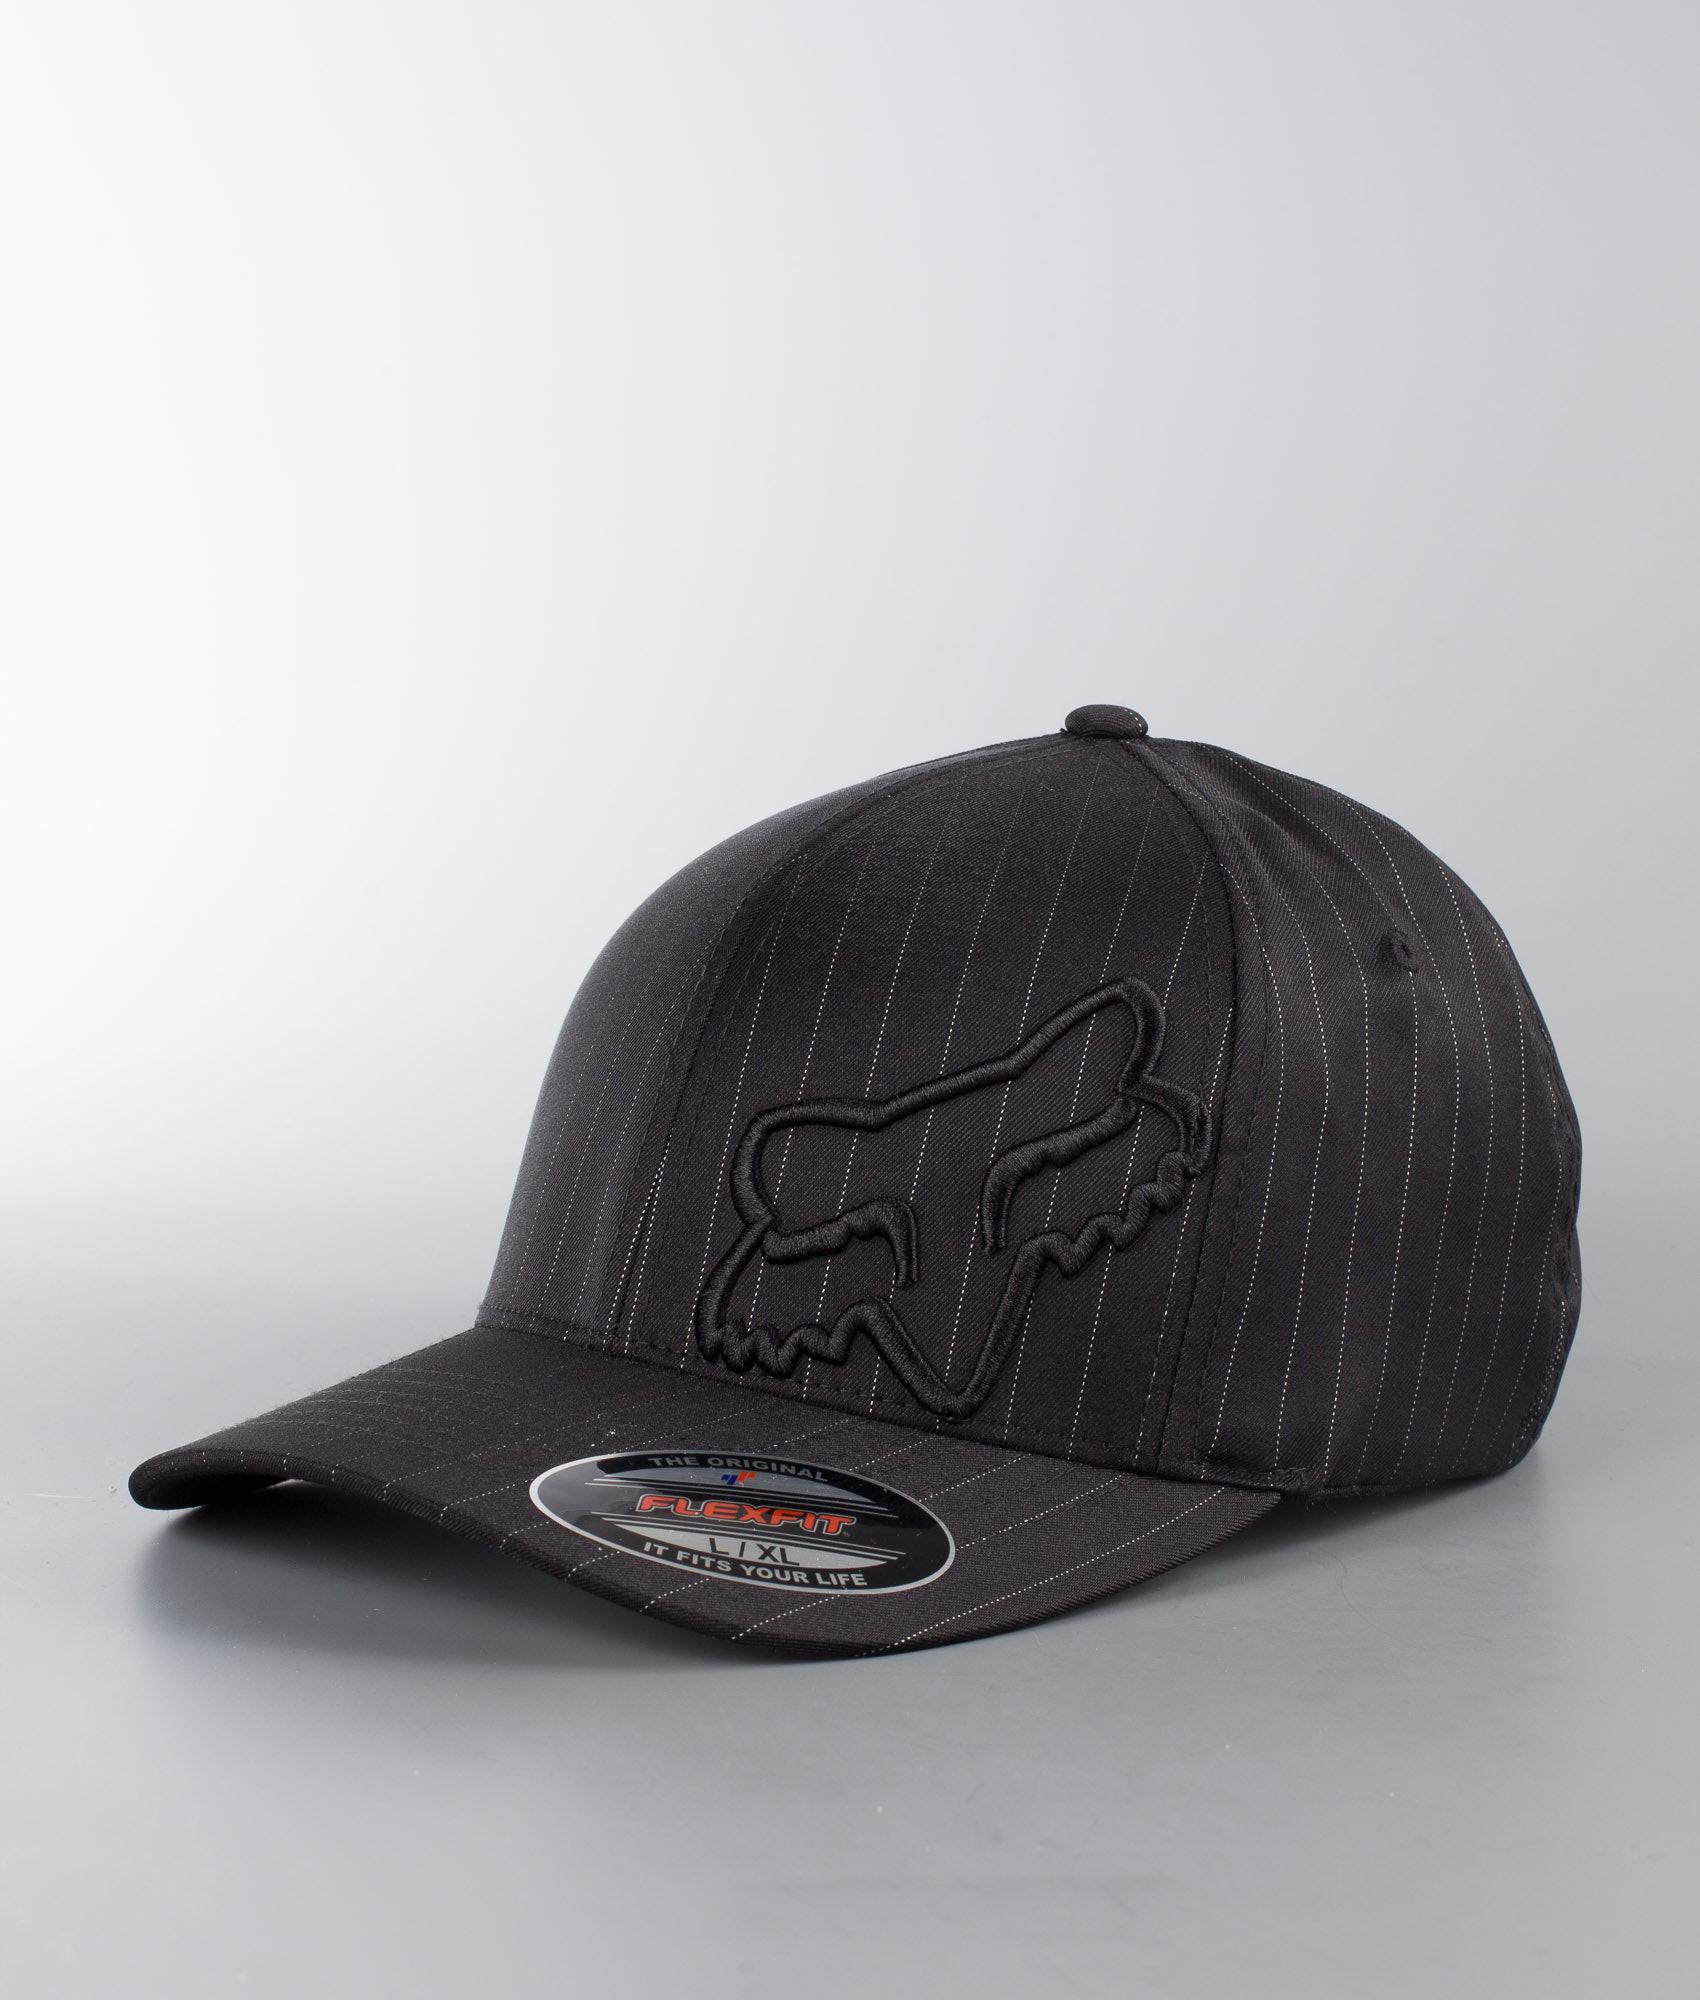 3fac82a9915 Fox Flex 45 Cap Black Pinstripe - Ridestore.com